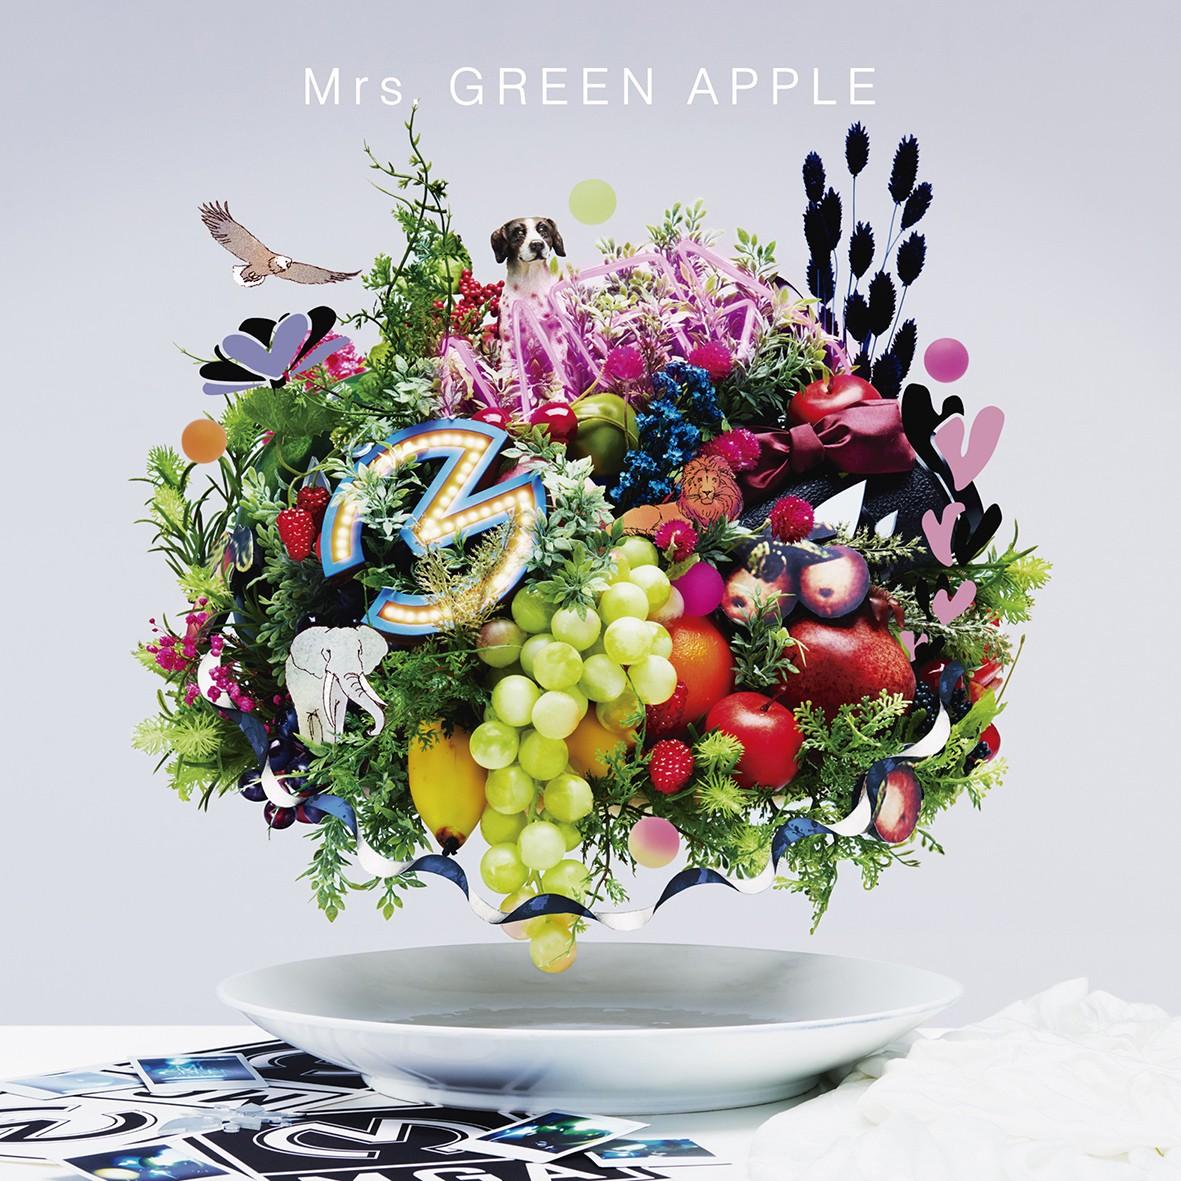 Mrs. GREEN APPLE - 5